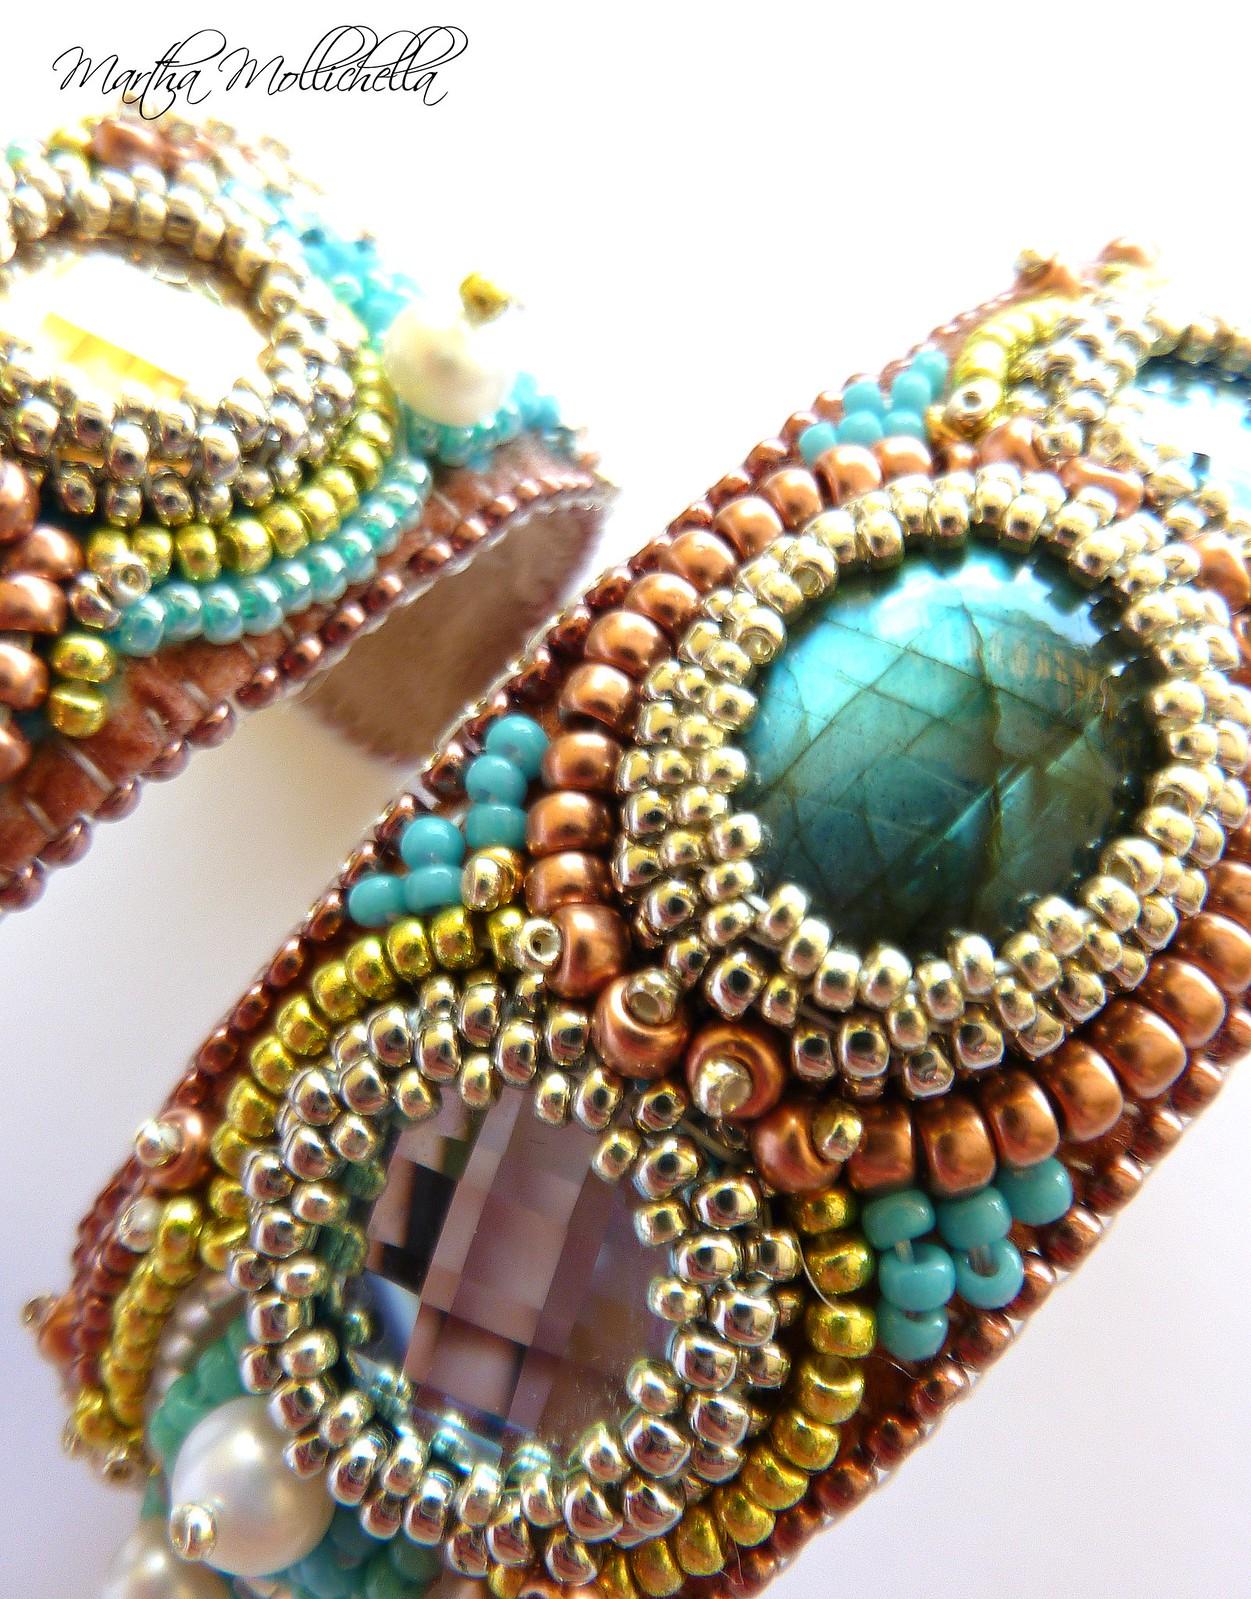 bracciali ricamati a mano bead embroidery bracelet by Martha Mollichella Handmade Jewelry